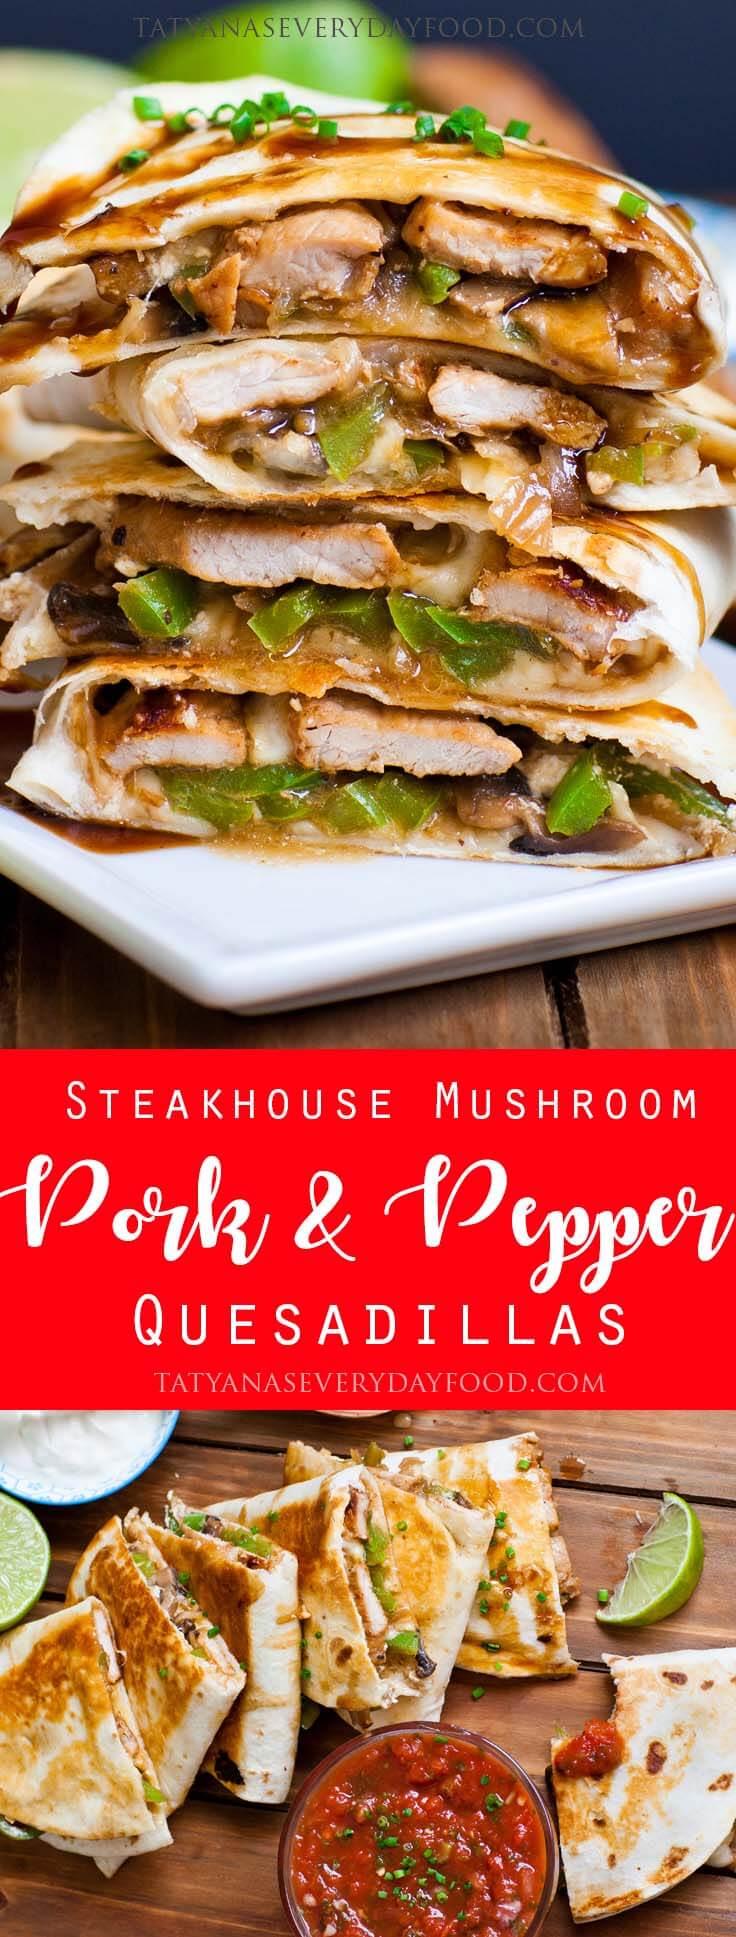 Pork and Pepper Quesadillas photo